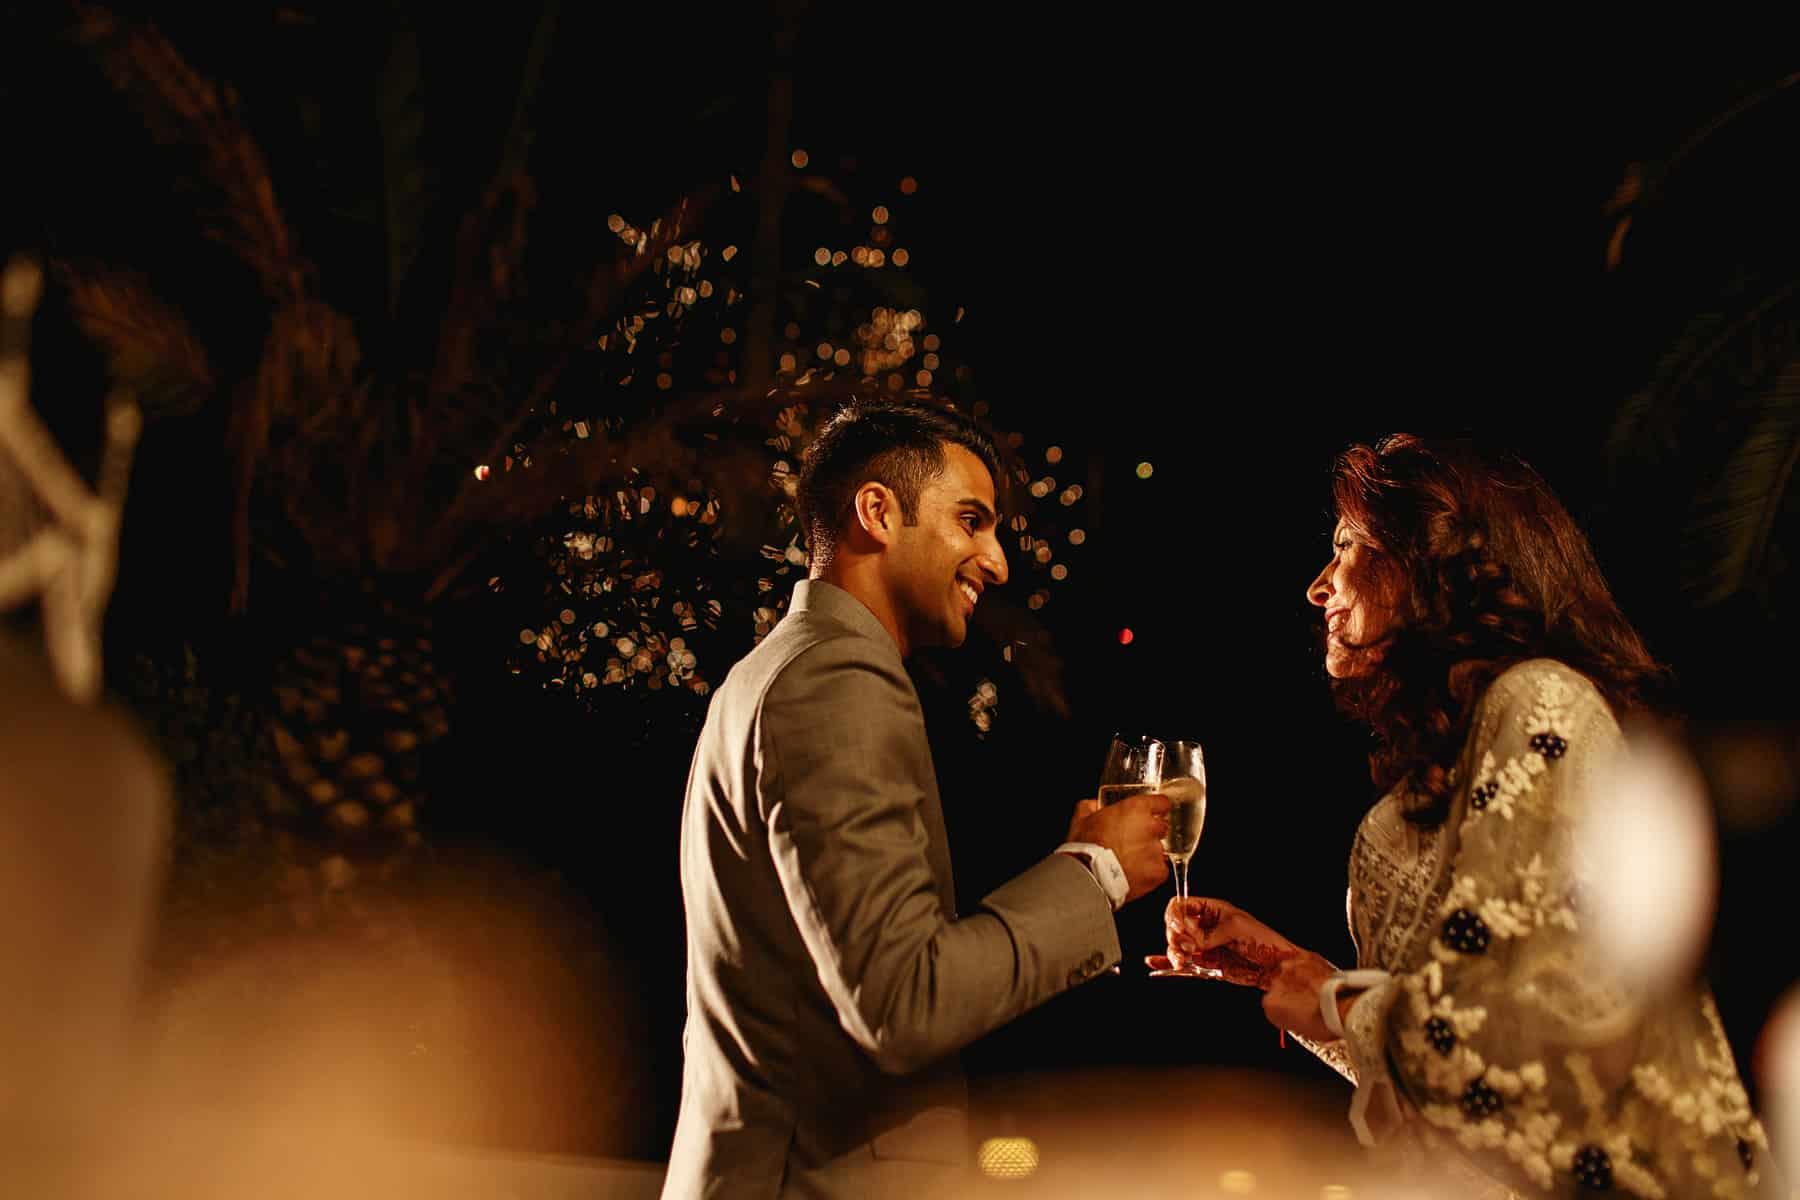 paestum italy weddings indian